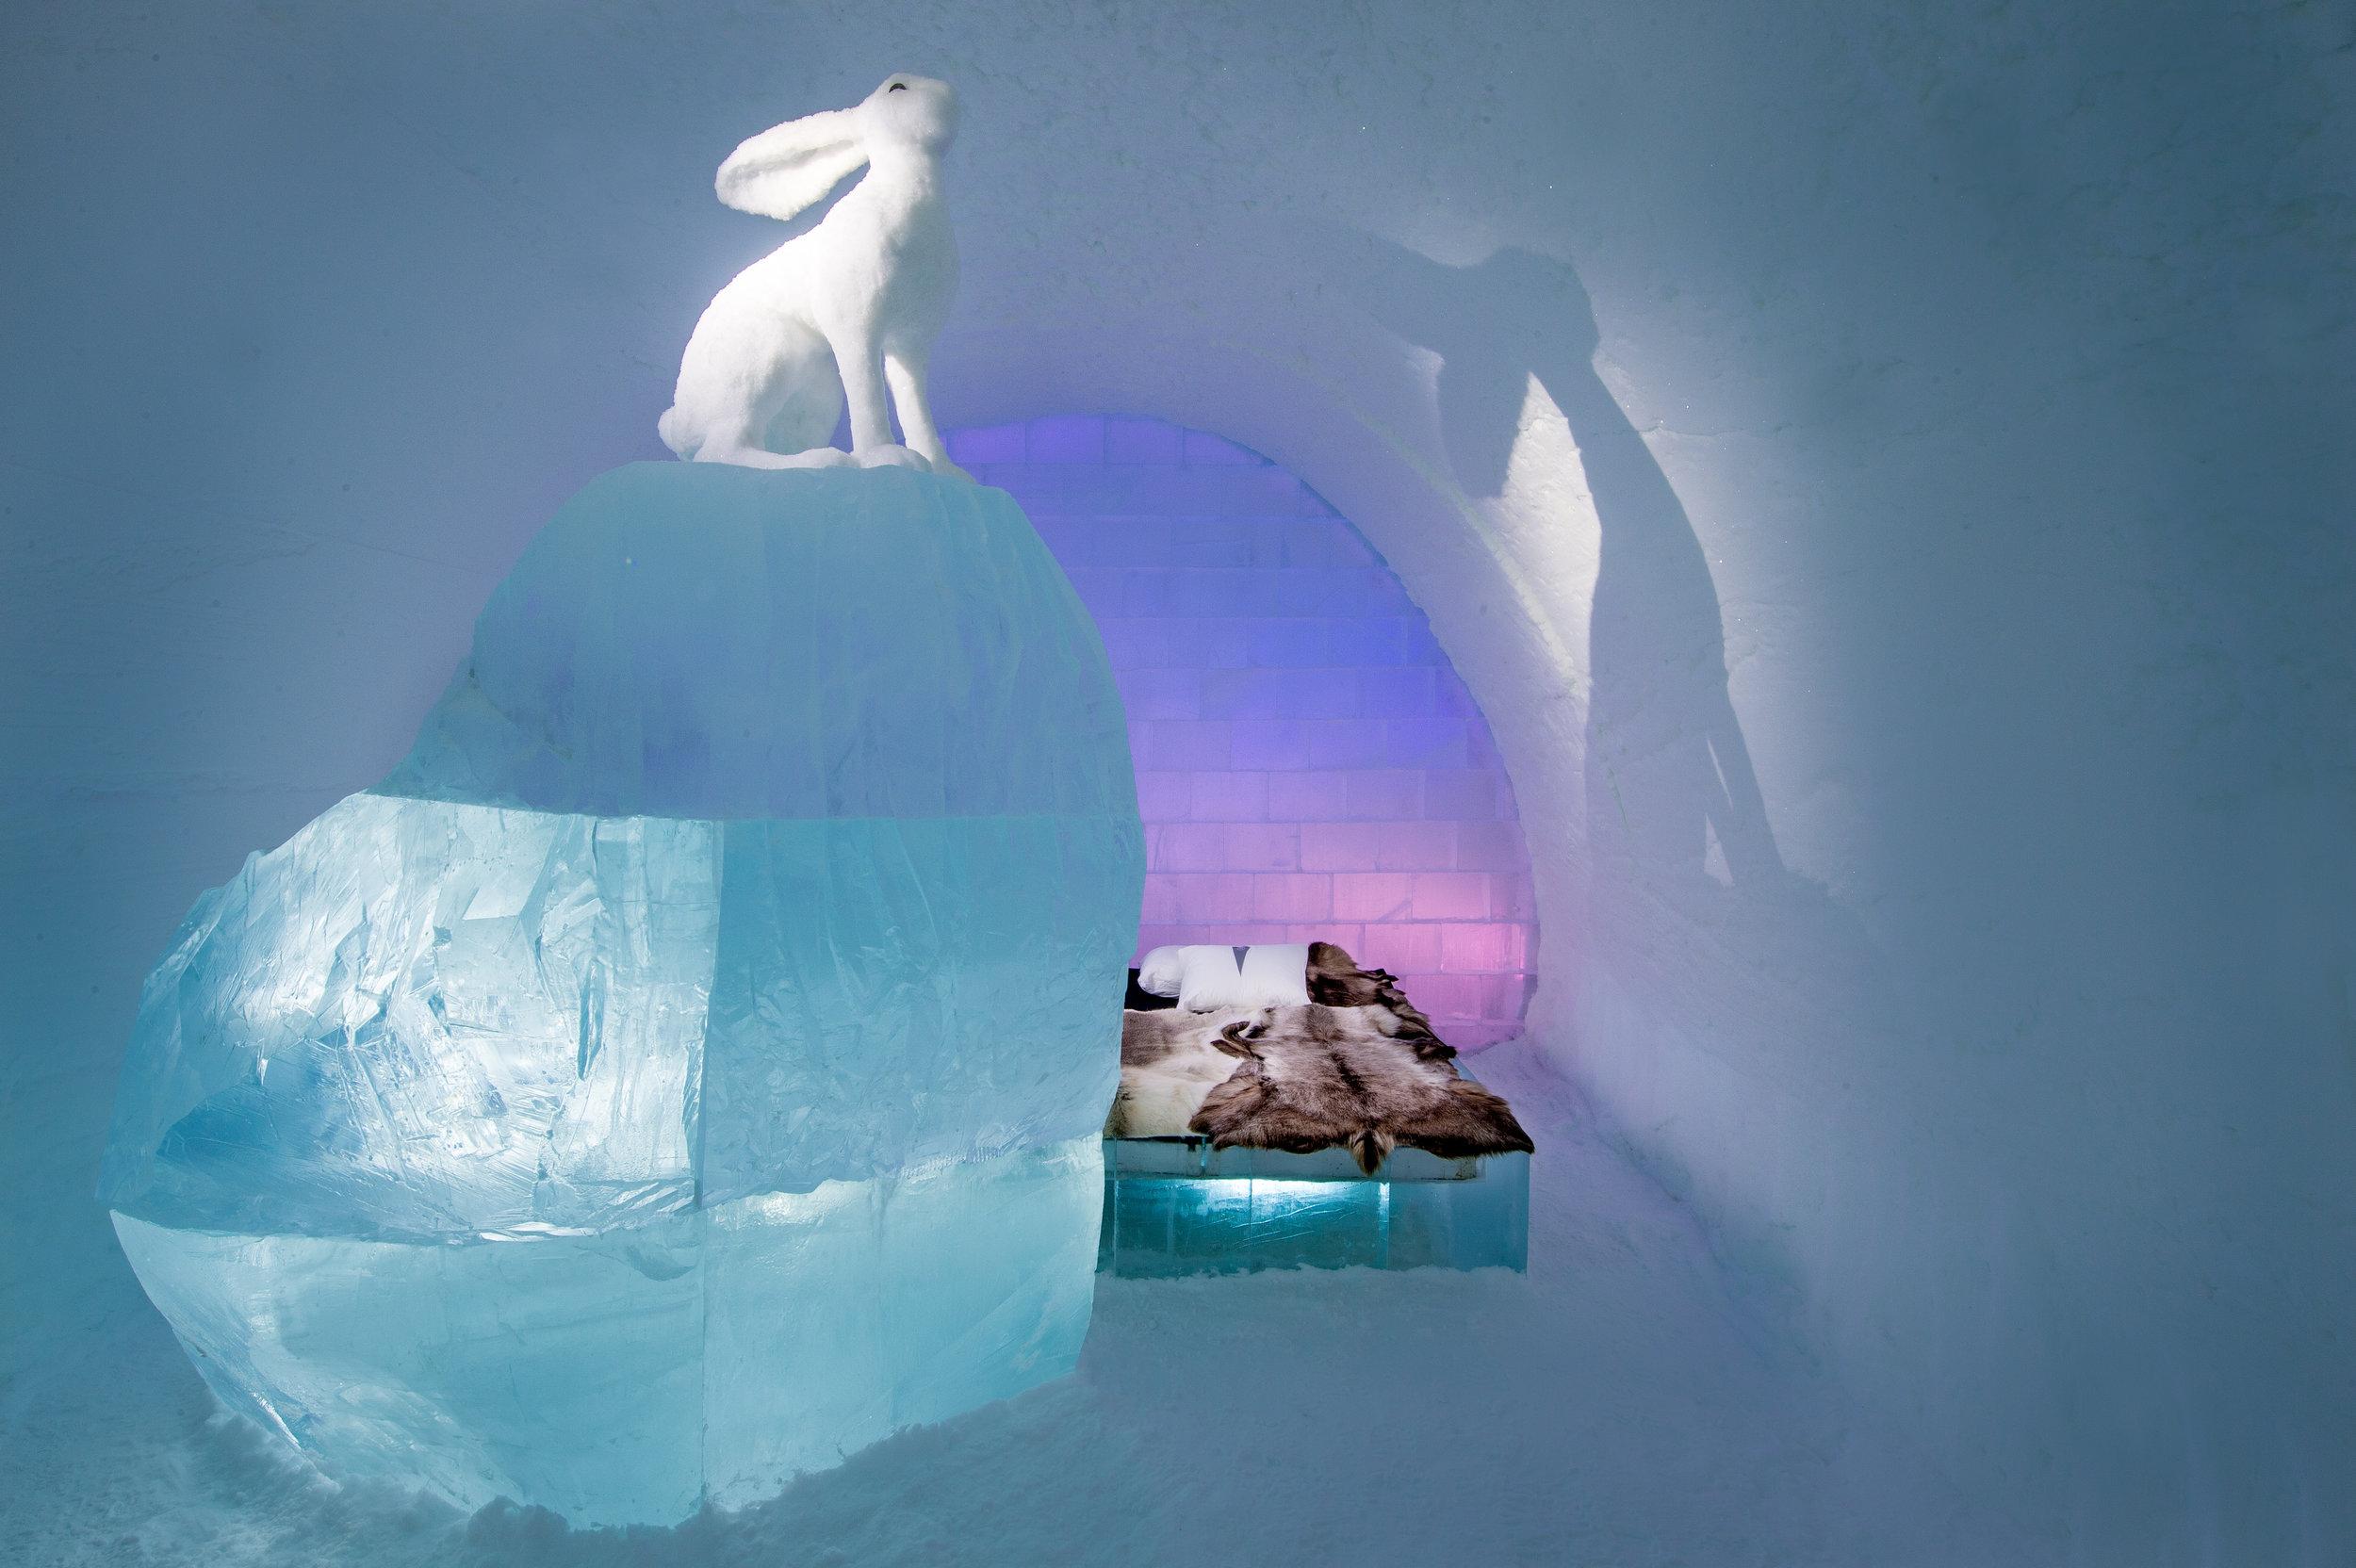 Art suite - Follow the White Rabbit-AnnaSofia Mååg & Niklas Byman- ICEHOTEL 28  Photo by - Asaf Kliger.jpg